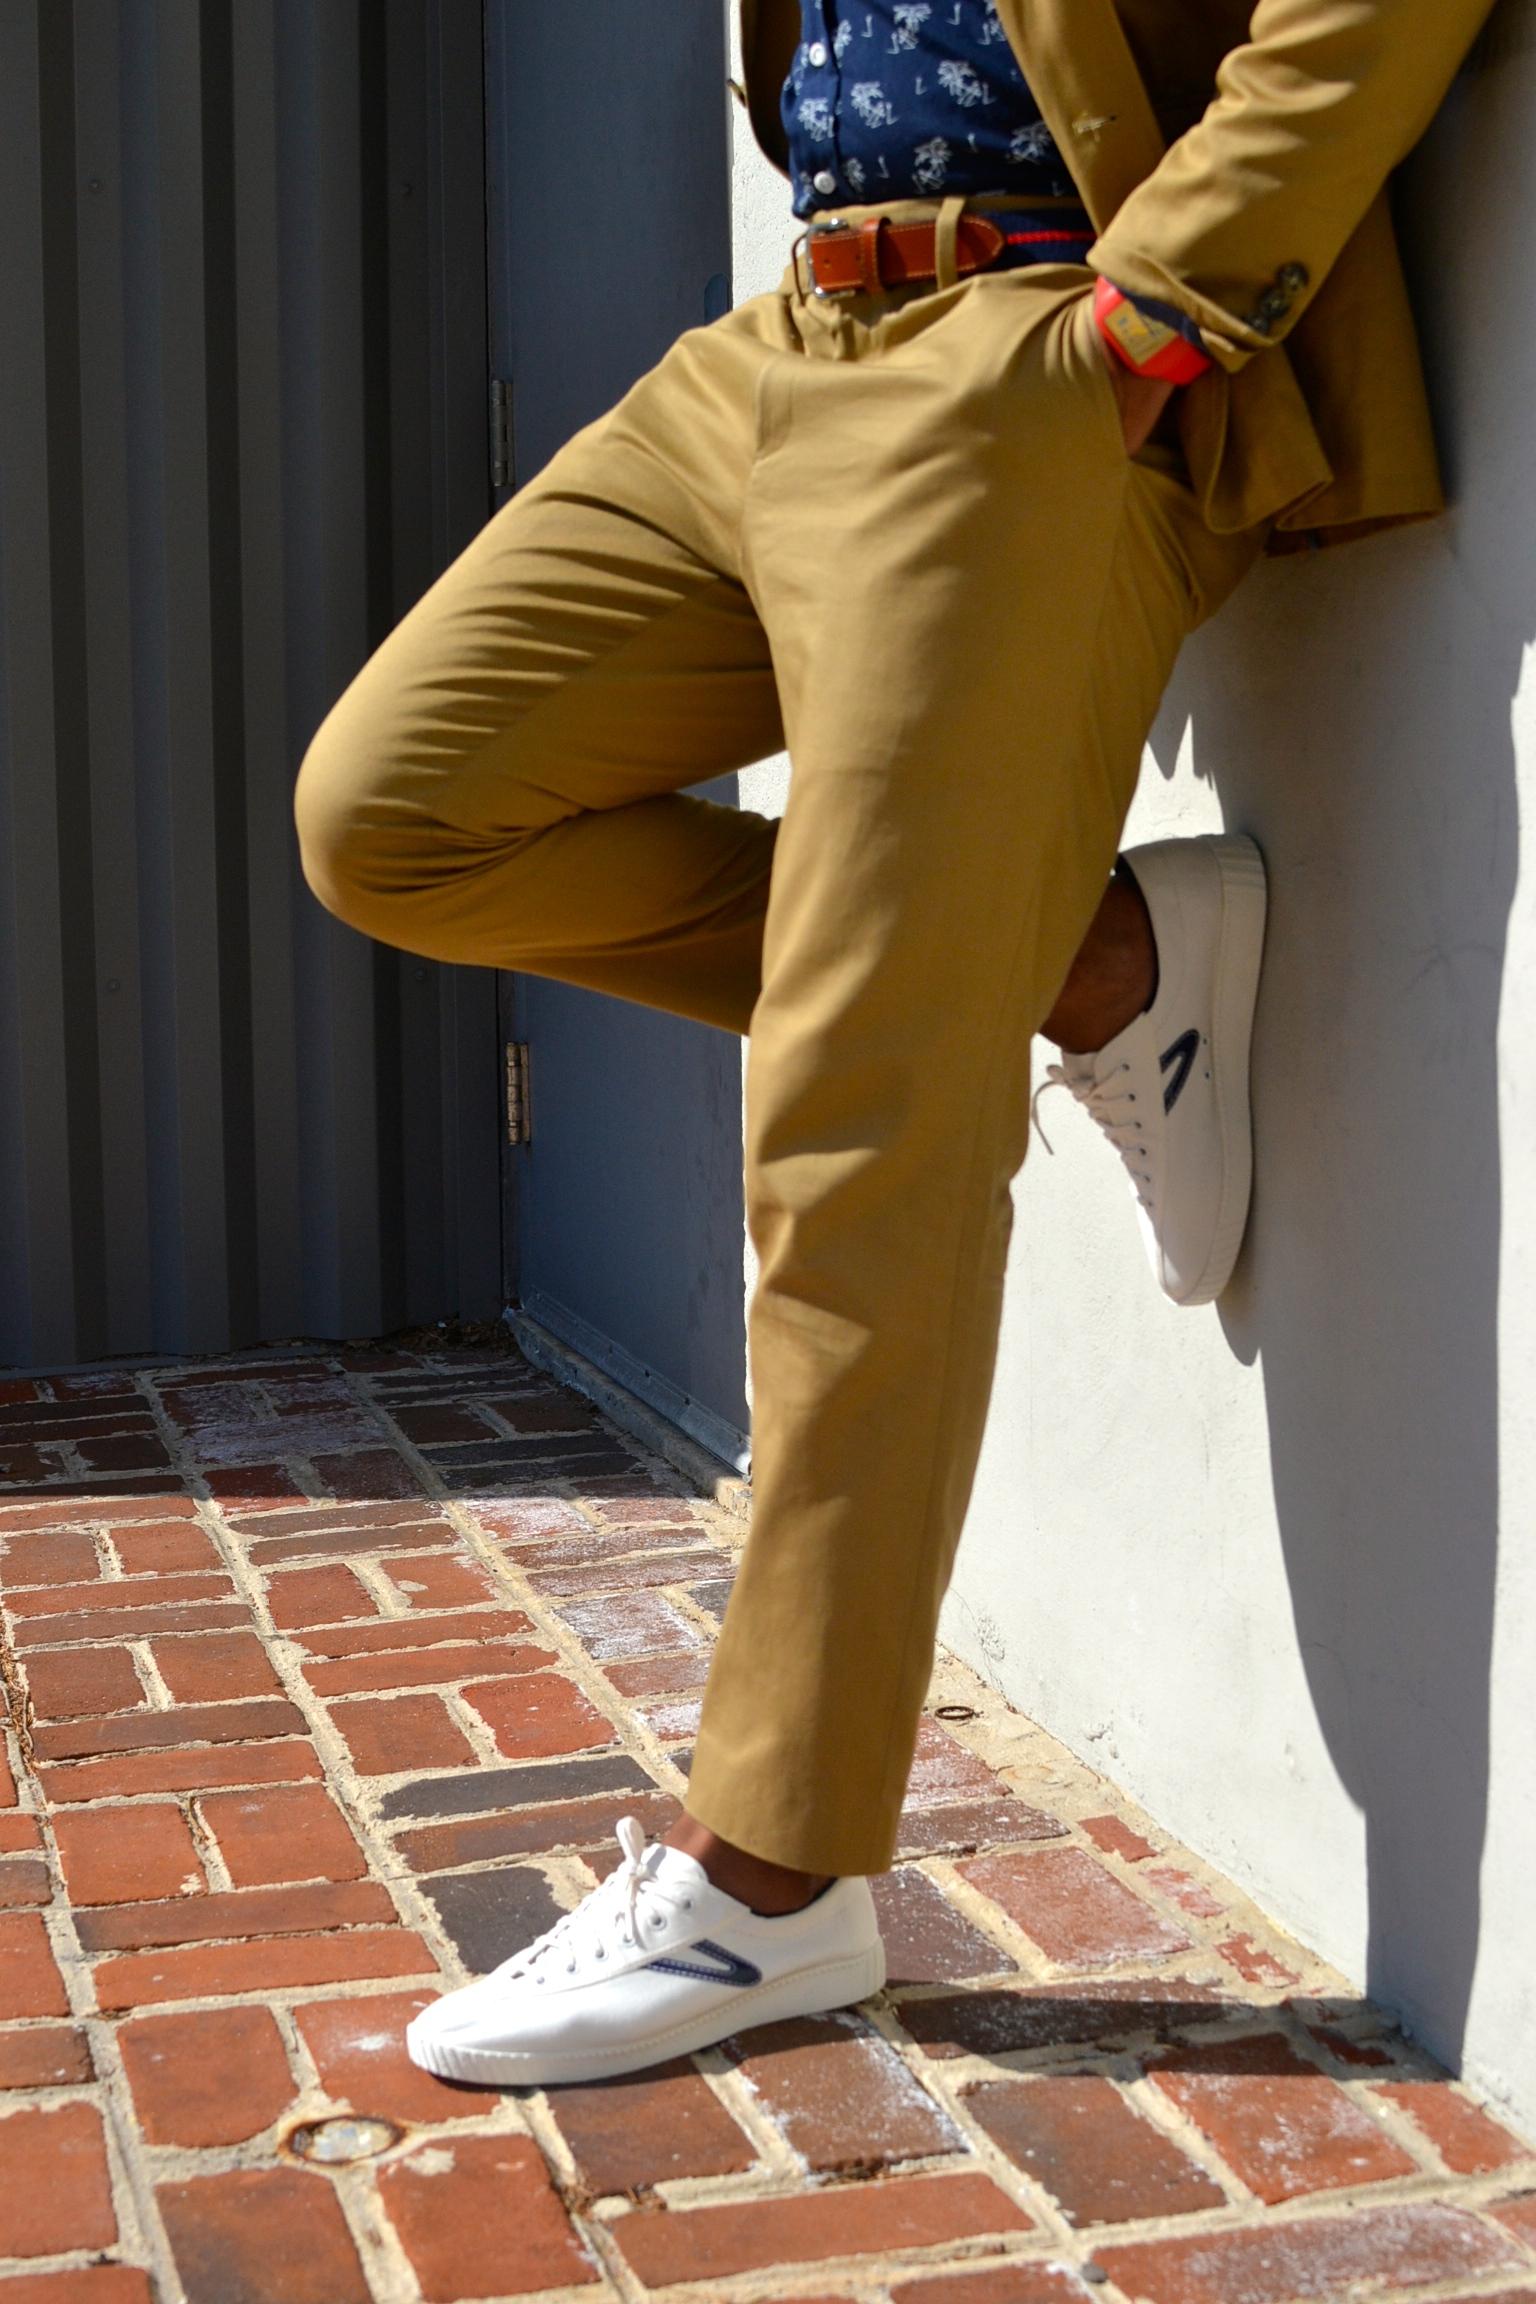 Tretorn Nylite on Men's Style Pro